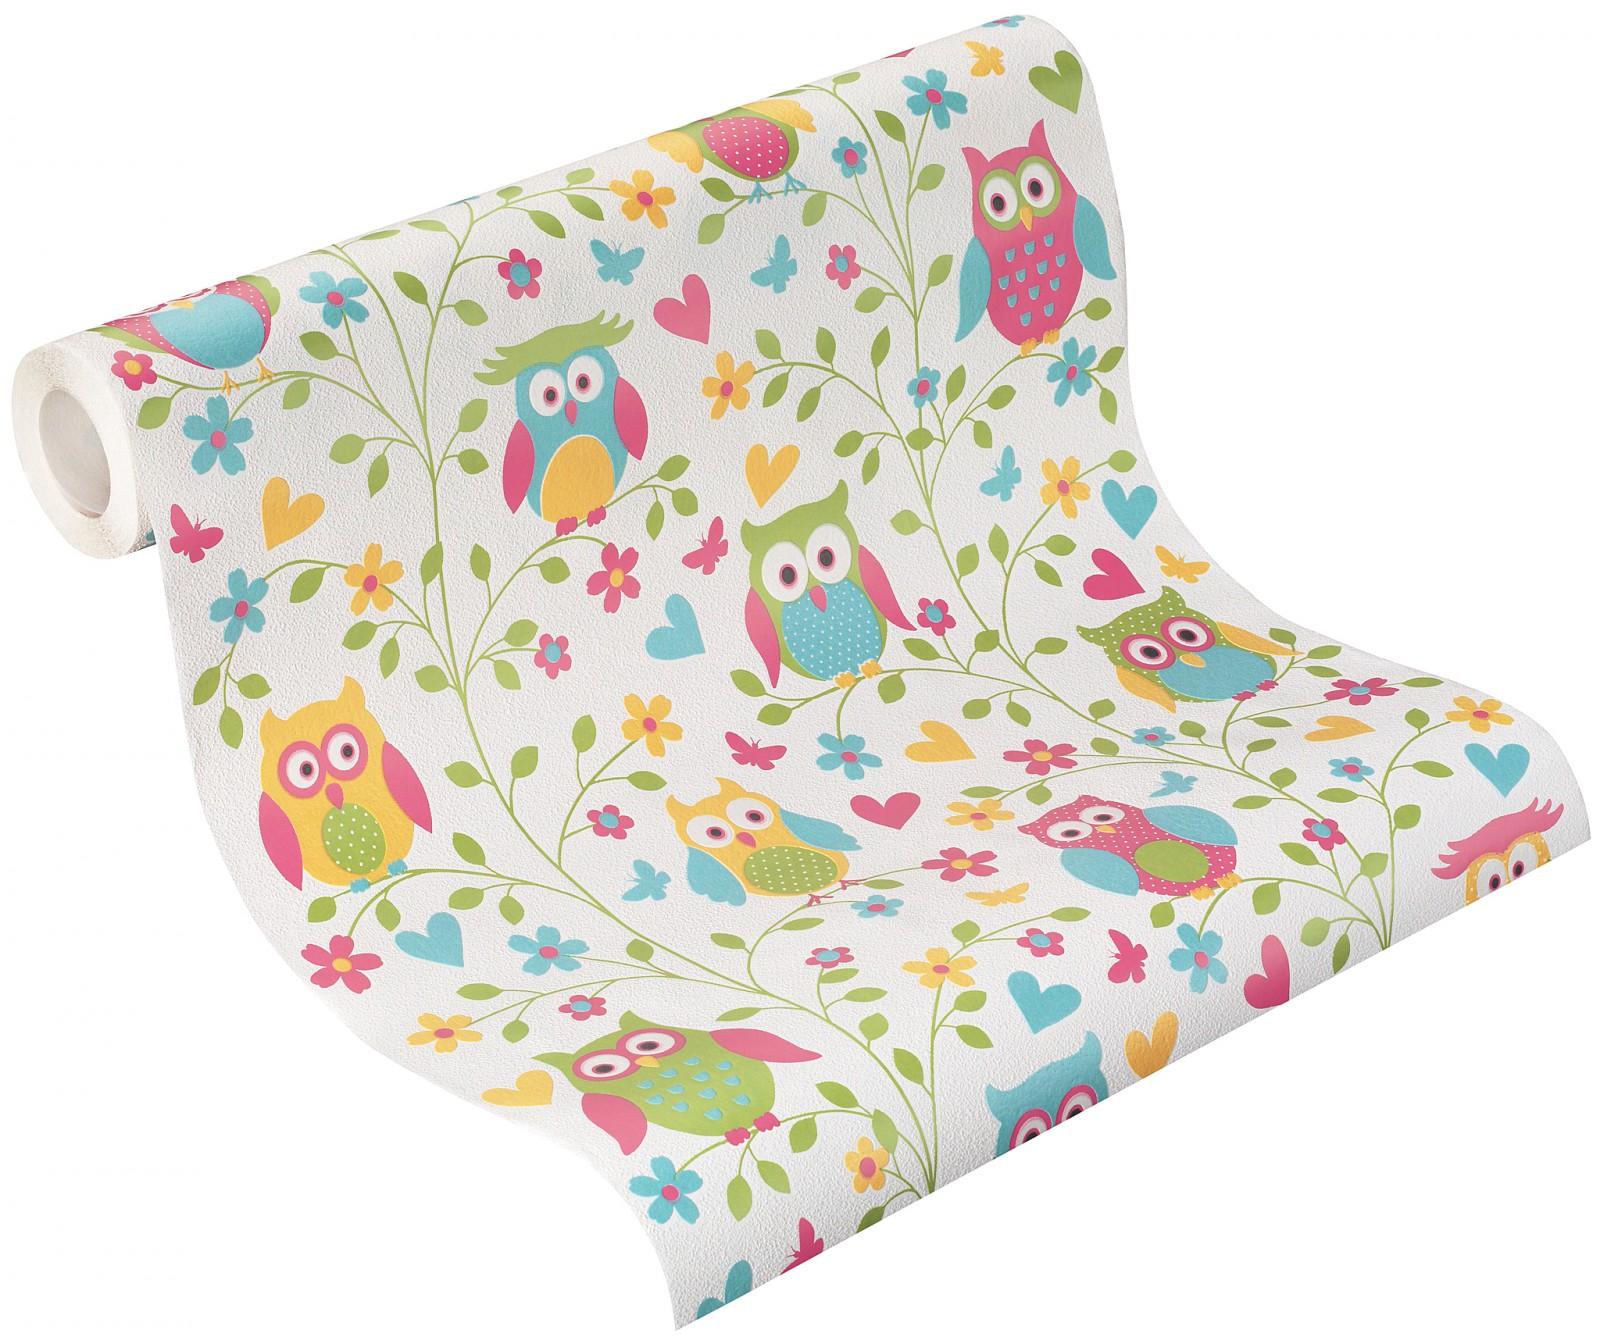 rasch vliestapete 459104 kids teens tapete eulen bunt. Black Bedroom Furniture Sets. Home Design Ideas